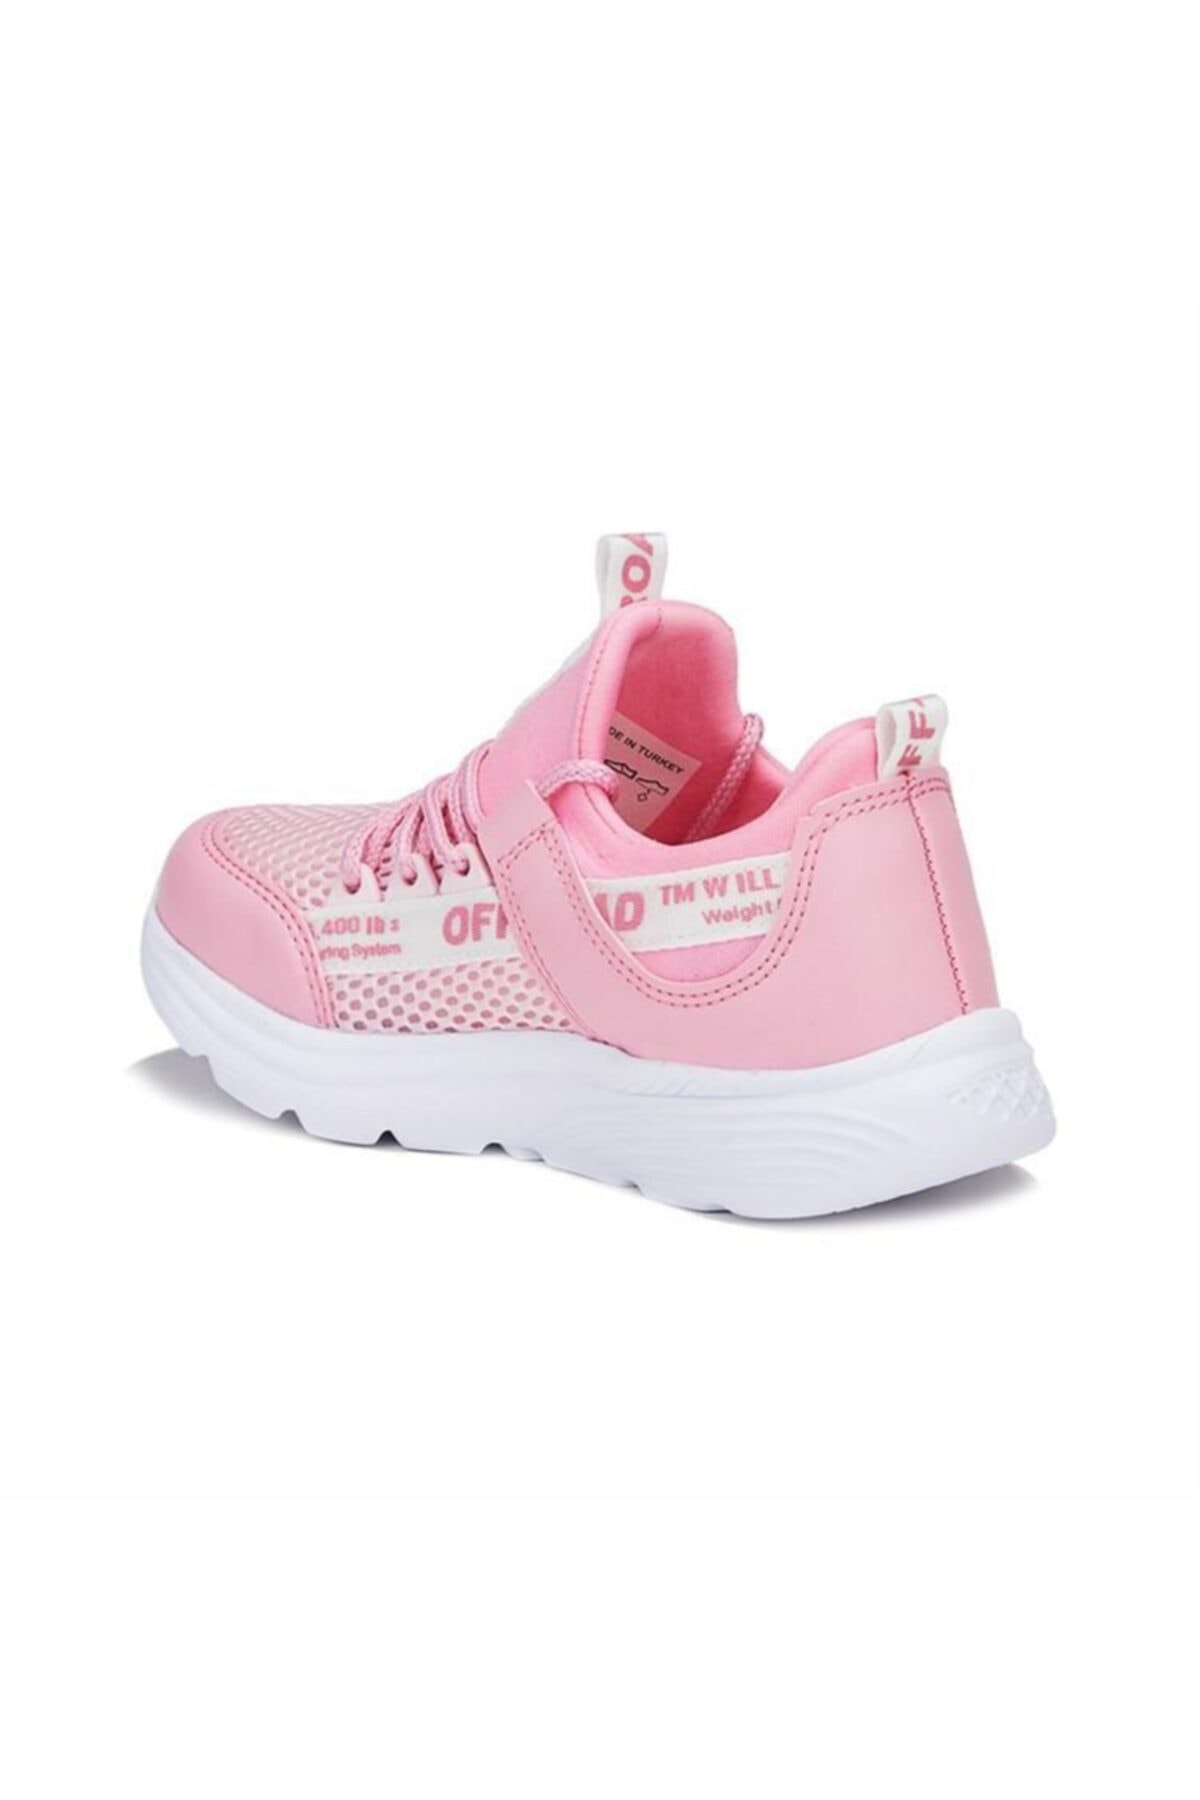 Vicco Ajax Pembe Kız Çocuk Spor Ayakkabı 346.f20y.514 2